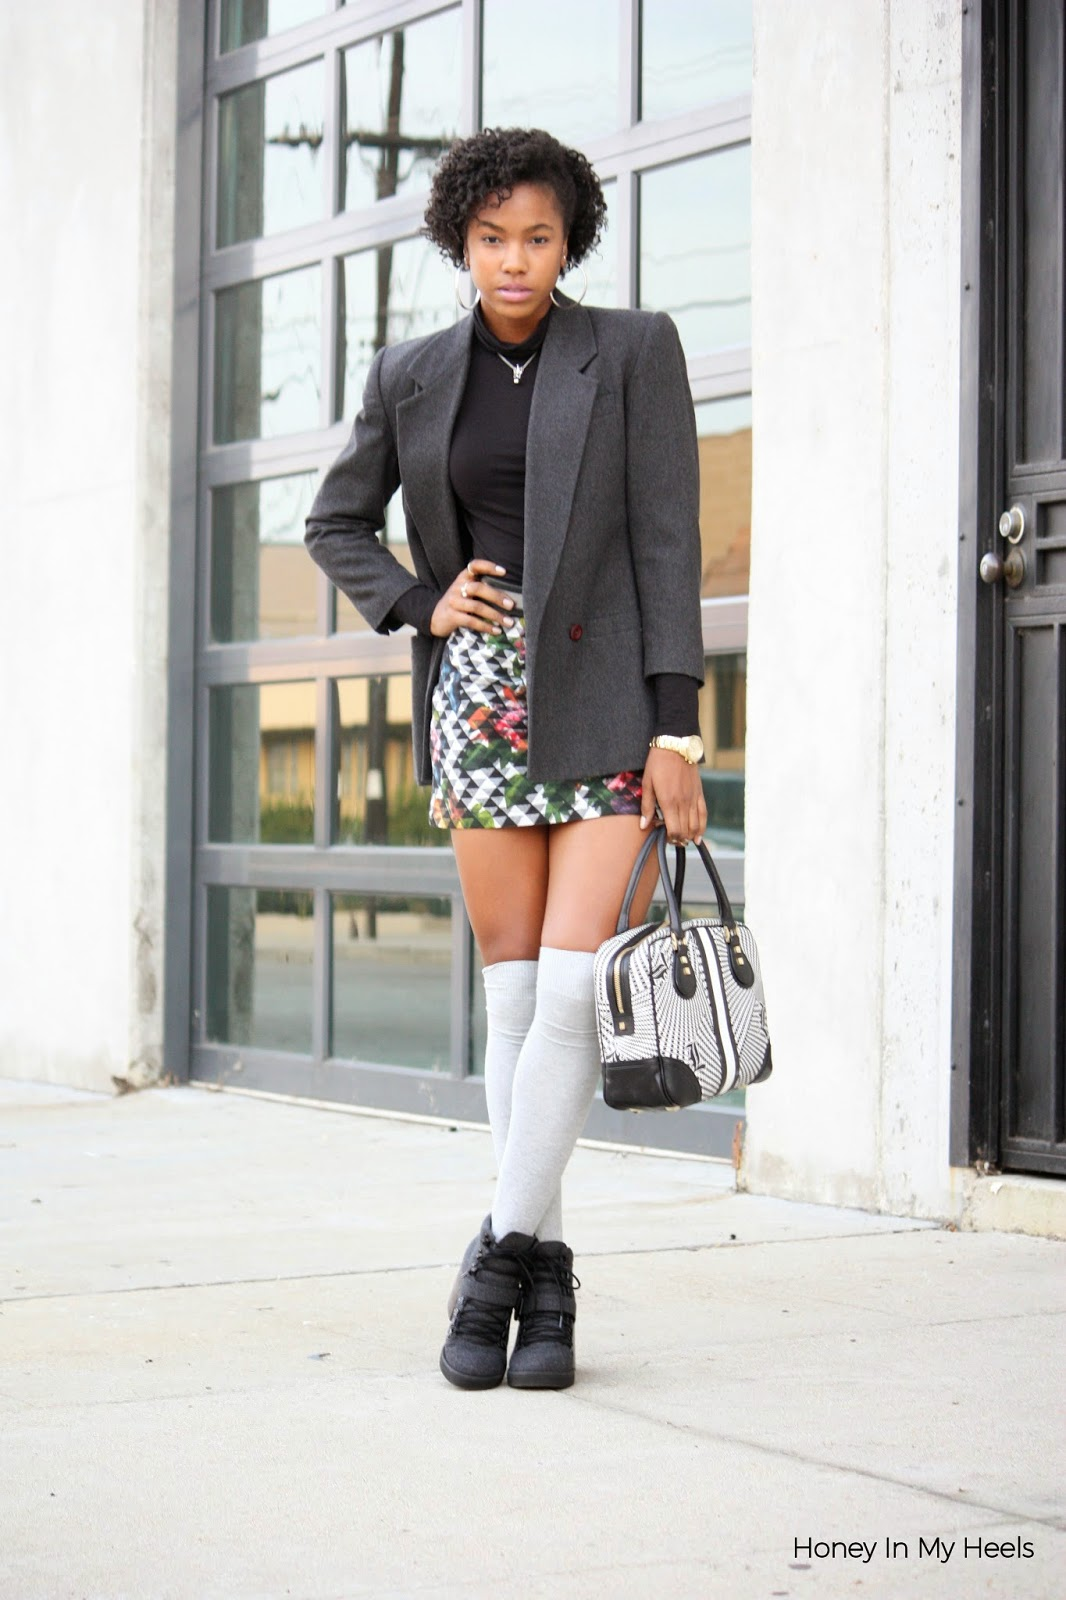 Wearing vintage blazer H&M turtleneck, Topshop mini skirt H&M socks with Topshop boots